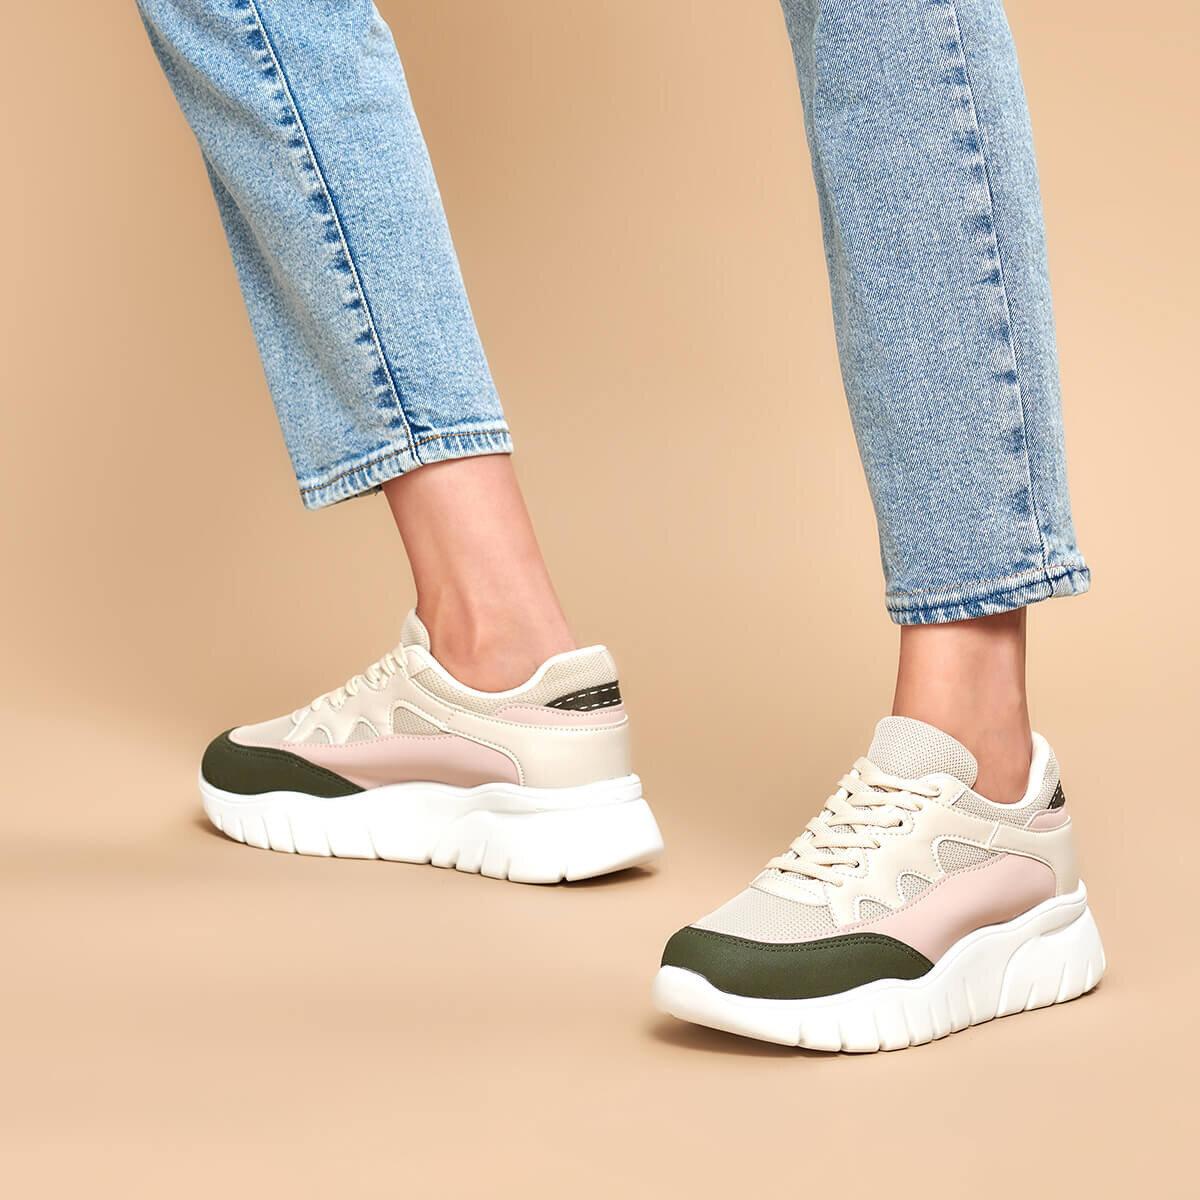 FLO 19K-251 Beige Women 'S Sneaker Shoes BUTIGO